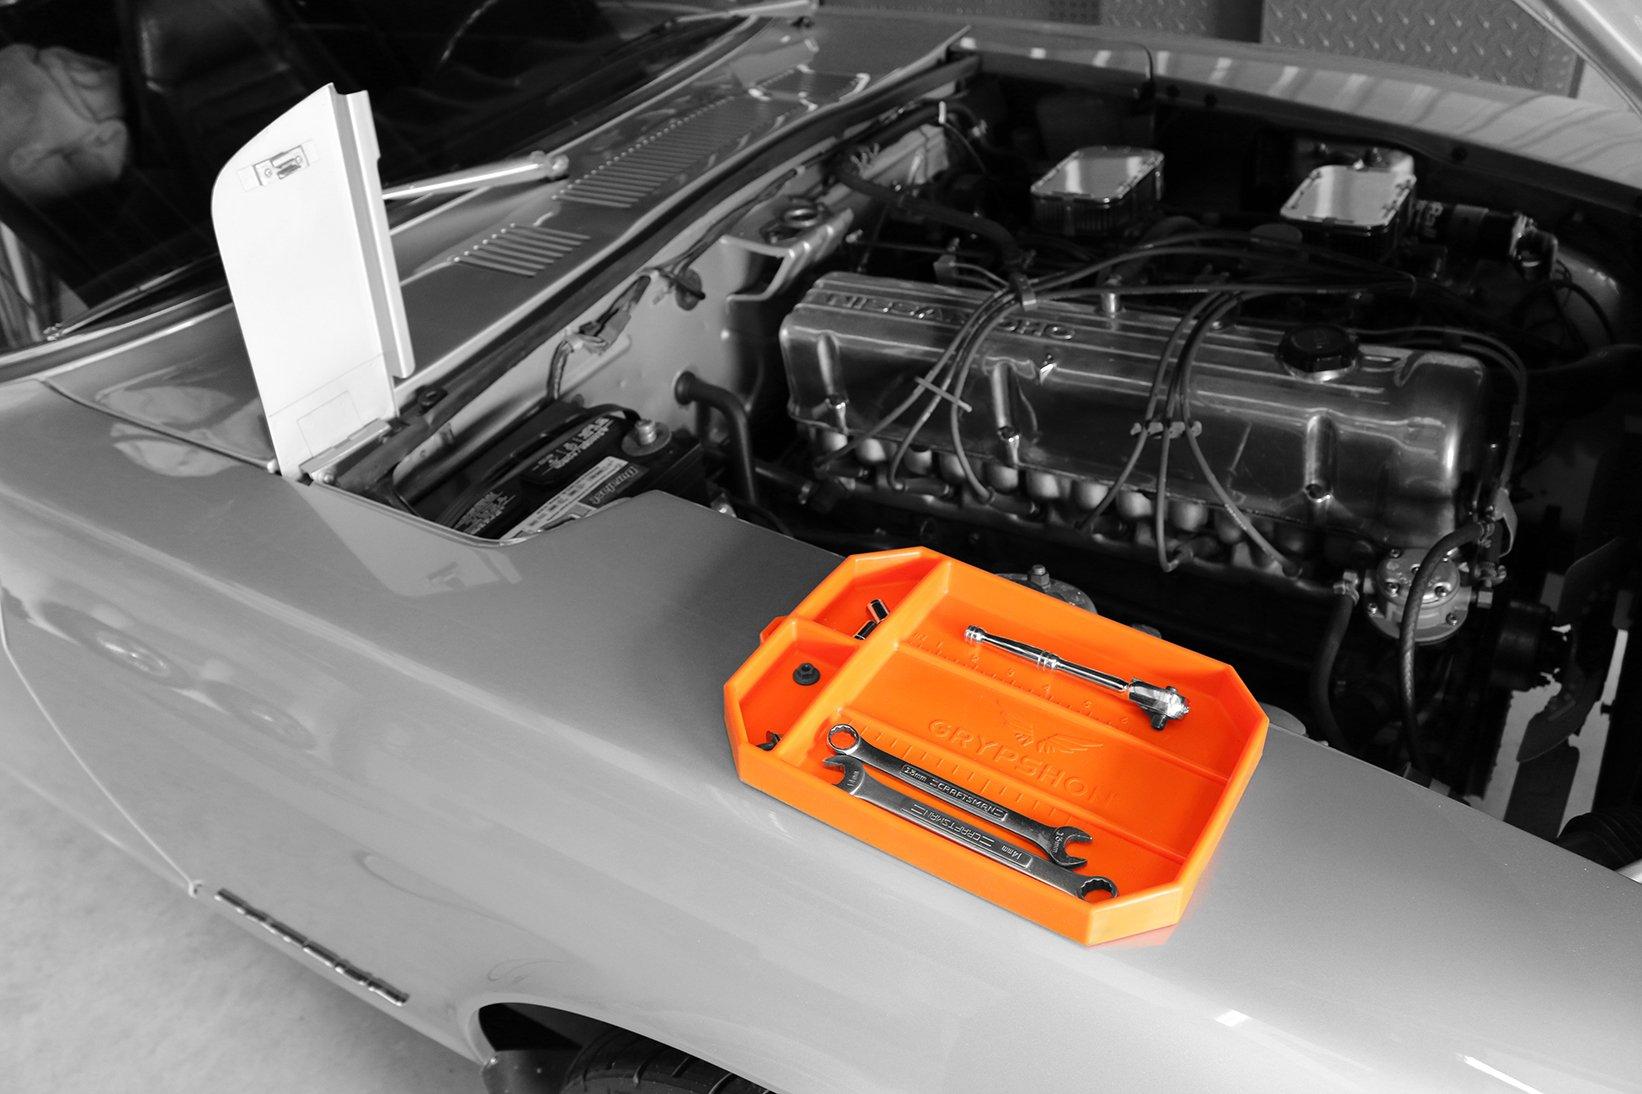 Grypmat | Non-Slip Flexible Orange Tool Tray | Tool Box Organizer | Socket Organizer | Tool Holder | Tool Mats | No Magnets | Easy Clean Up | As Seen On Shark Tank (Medium) by Grypshon (Image #3)